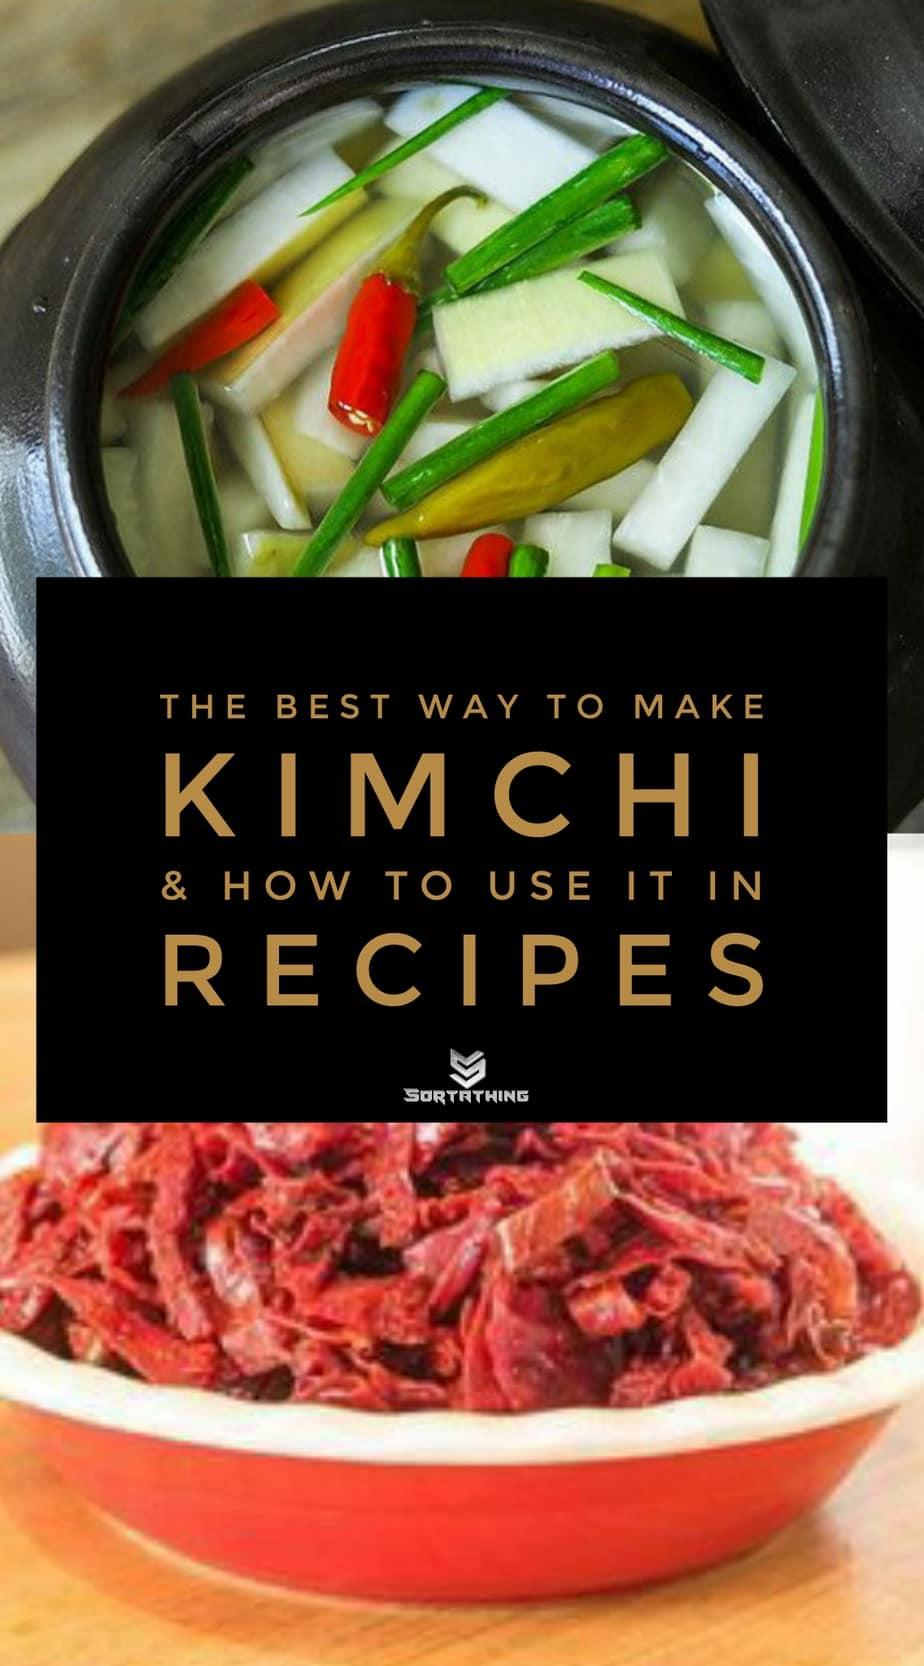 Dongchimi Korean Vegan Water Kimchi and Red Cabbage Kimchi